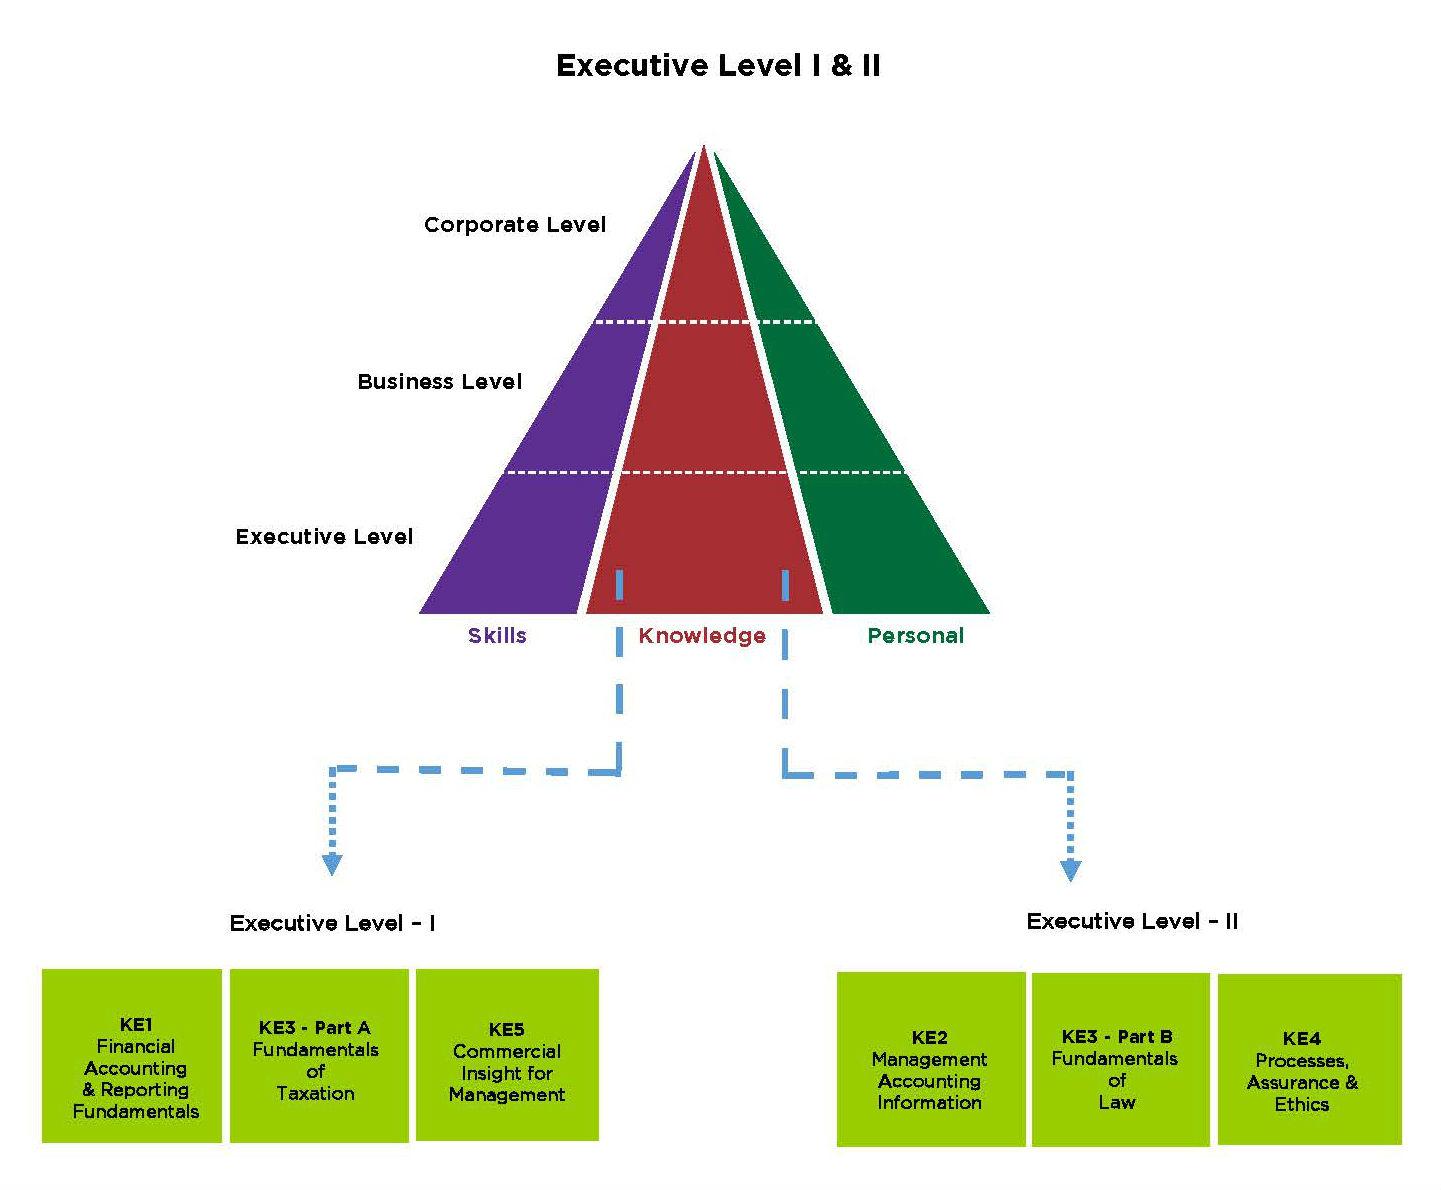 curriculum vitae meaning in sinhala